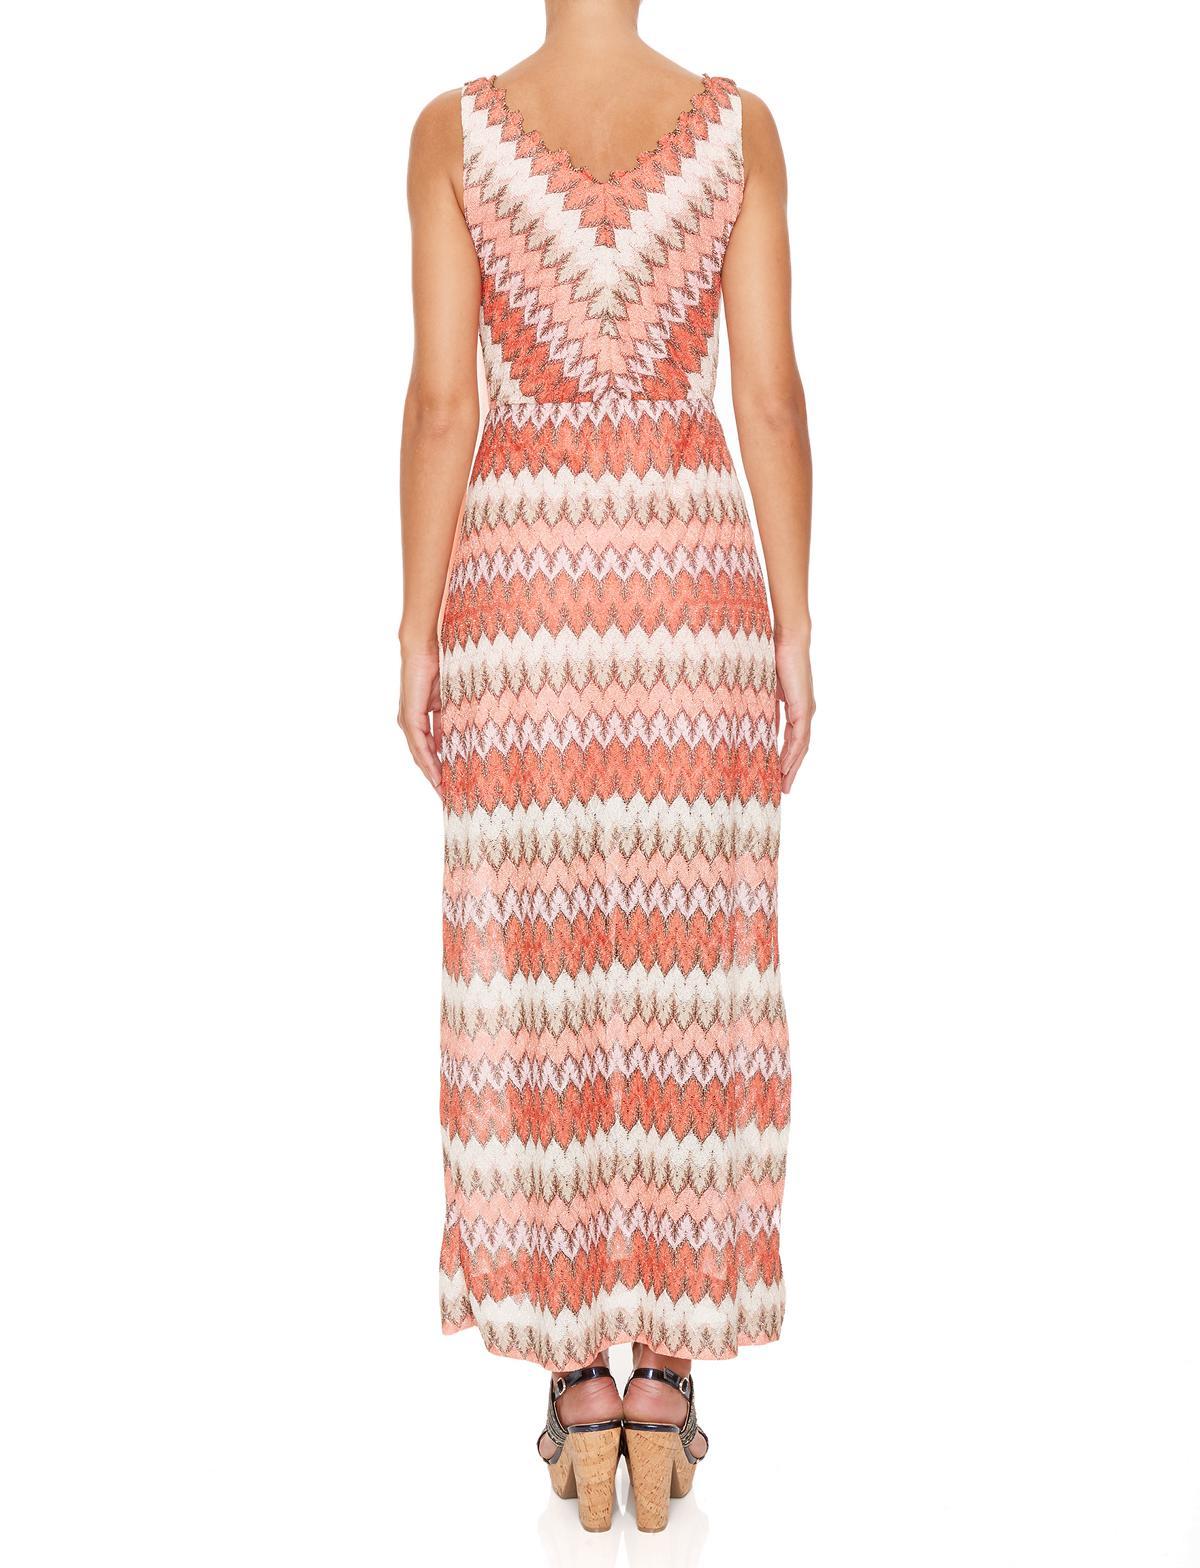 Rückansicht von Ana Alcazar Maxi Kleid Masikalys  angezogen an Model